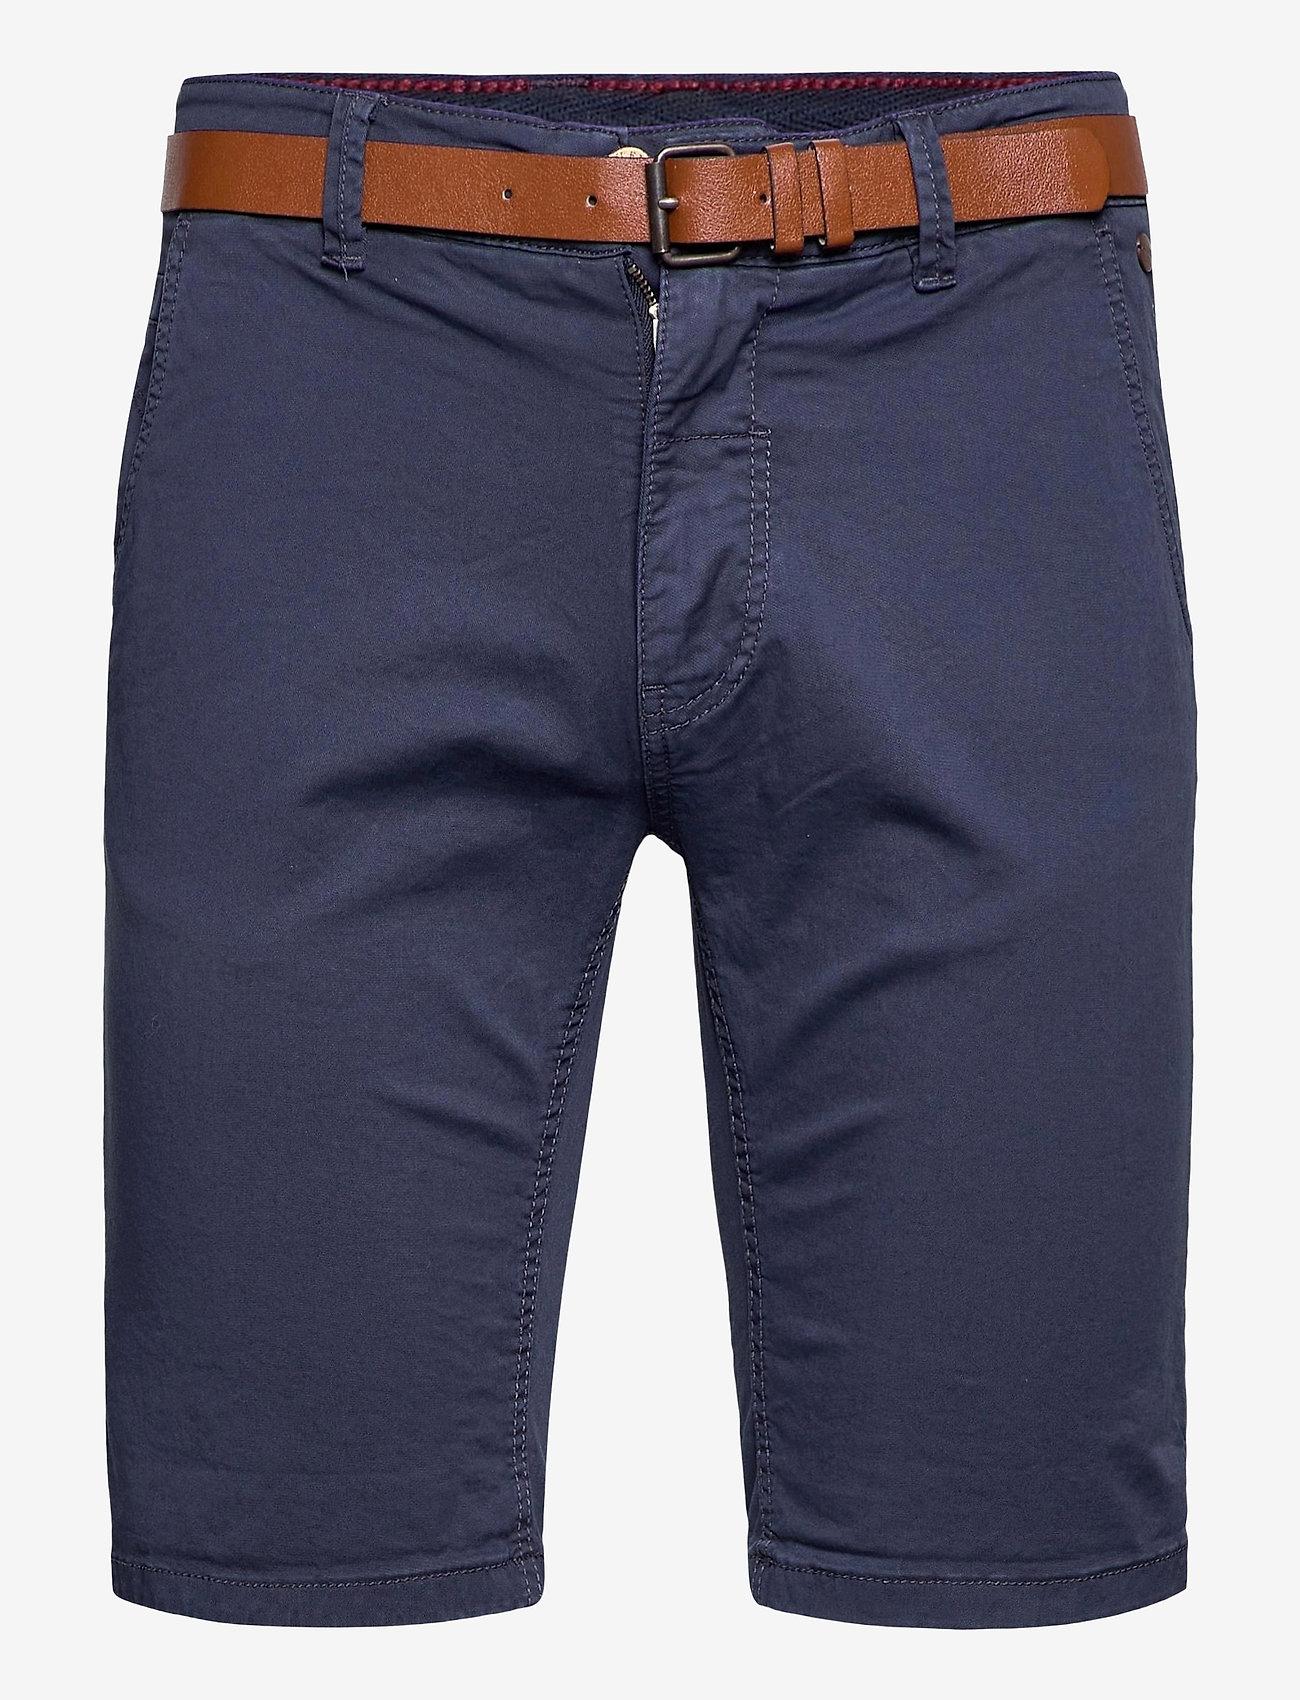 Blend - Shorts - chino's shorts - dress blues - 0